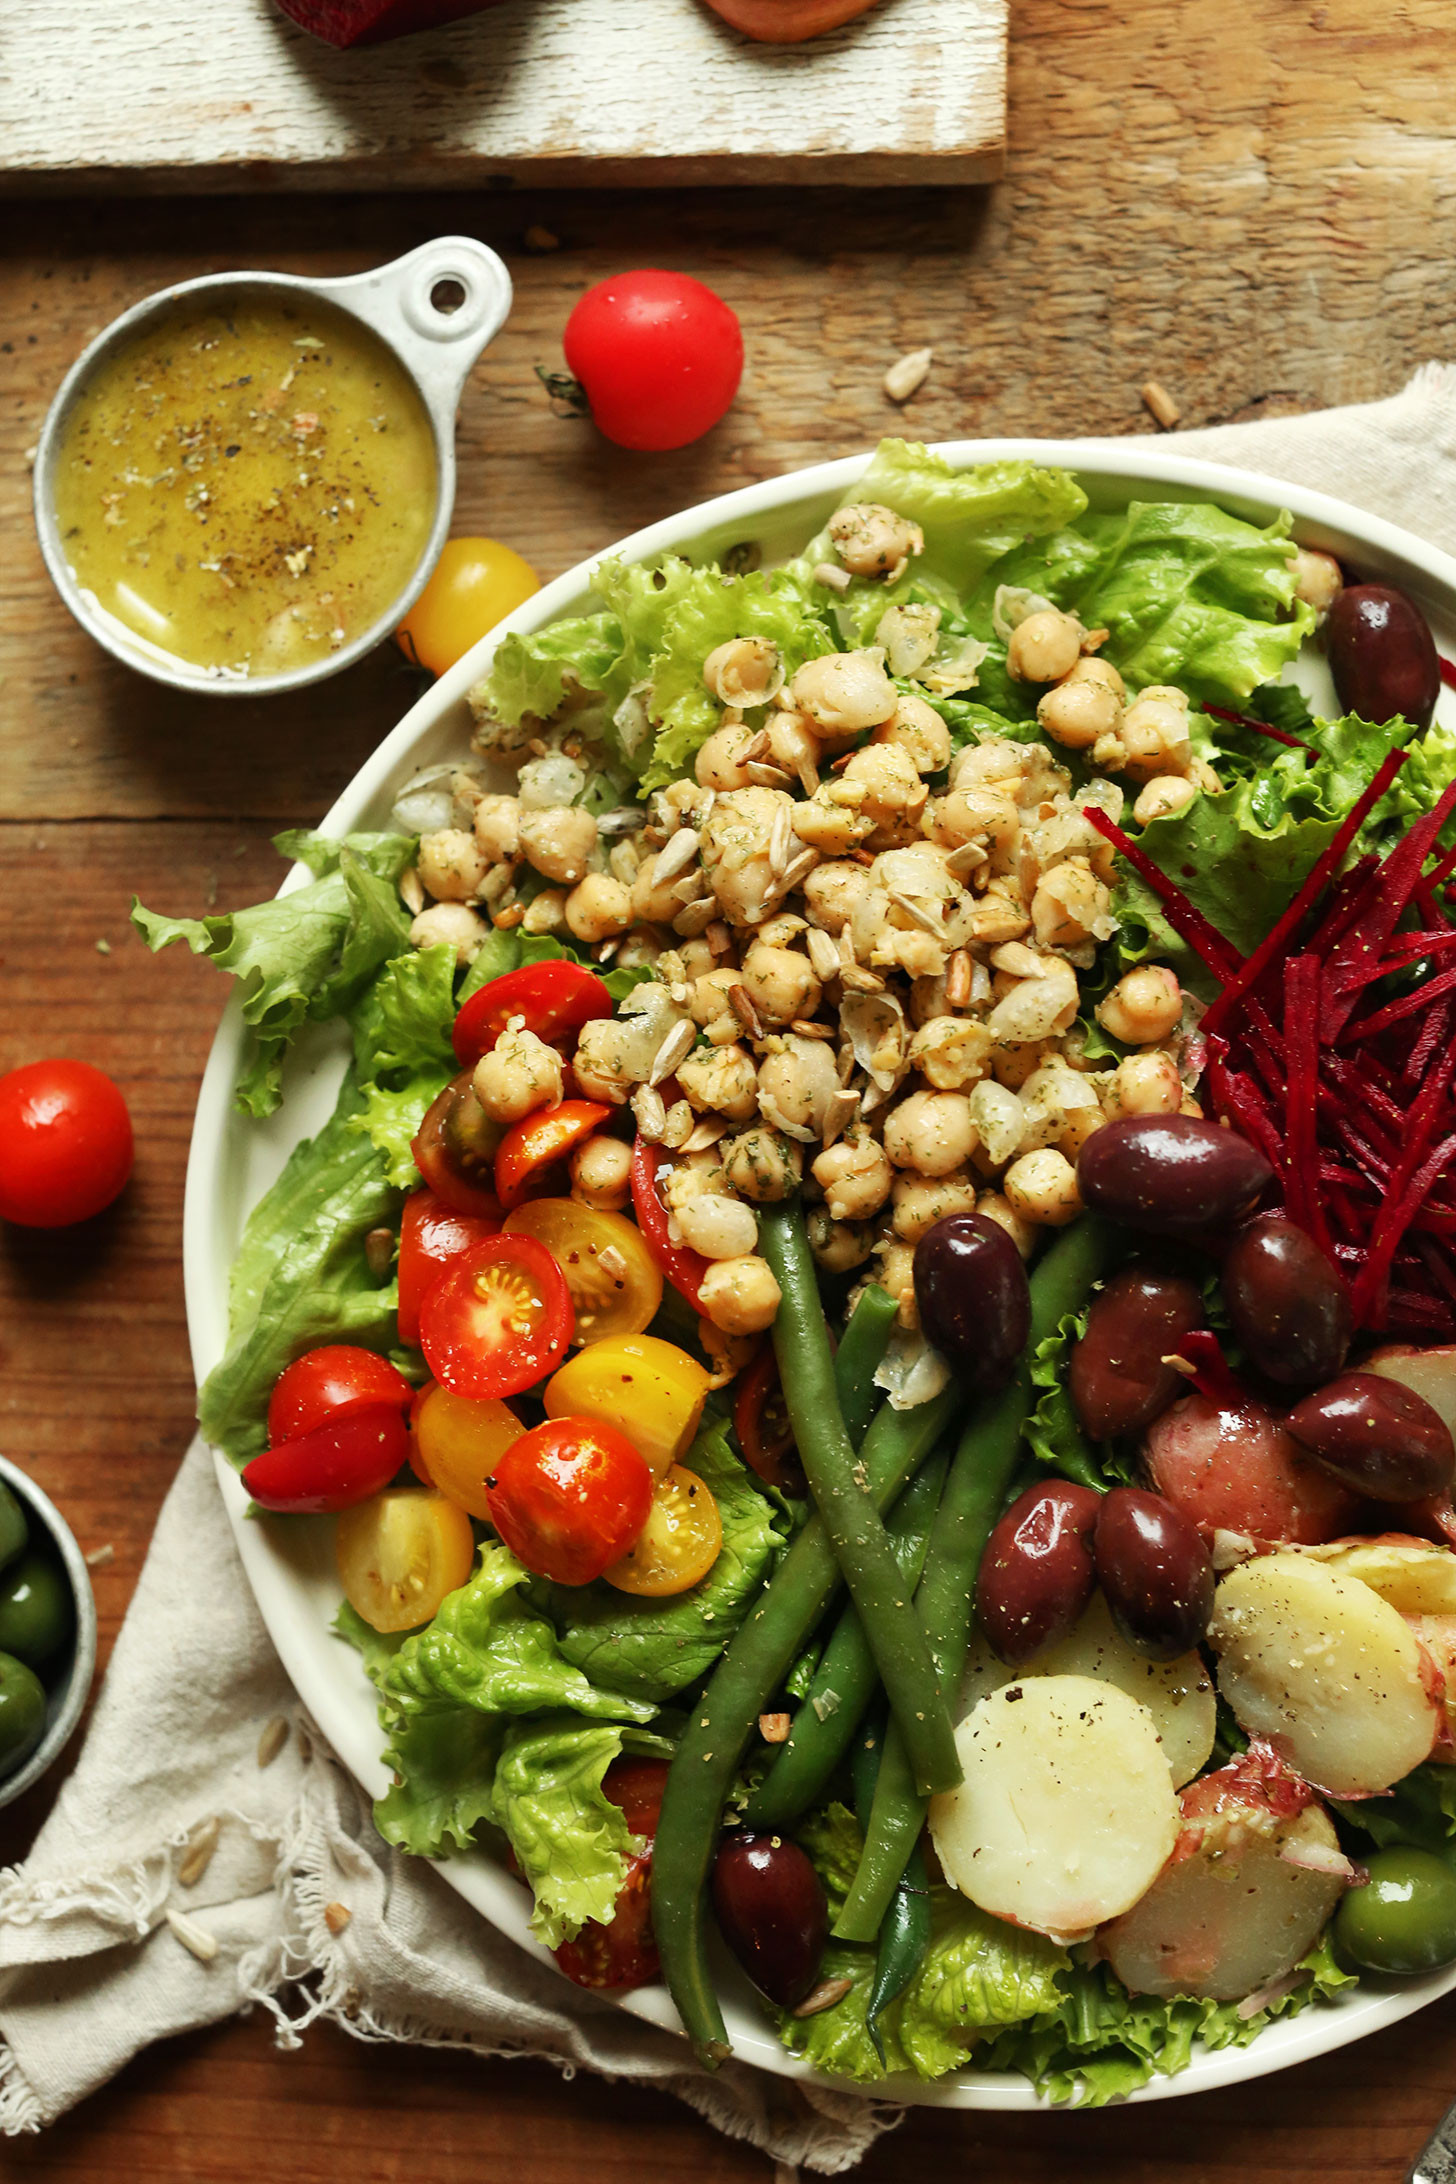 Healthy Vegetarian Salad Recipes  Vegan Nicoise Salad